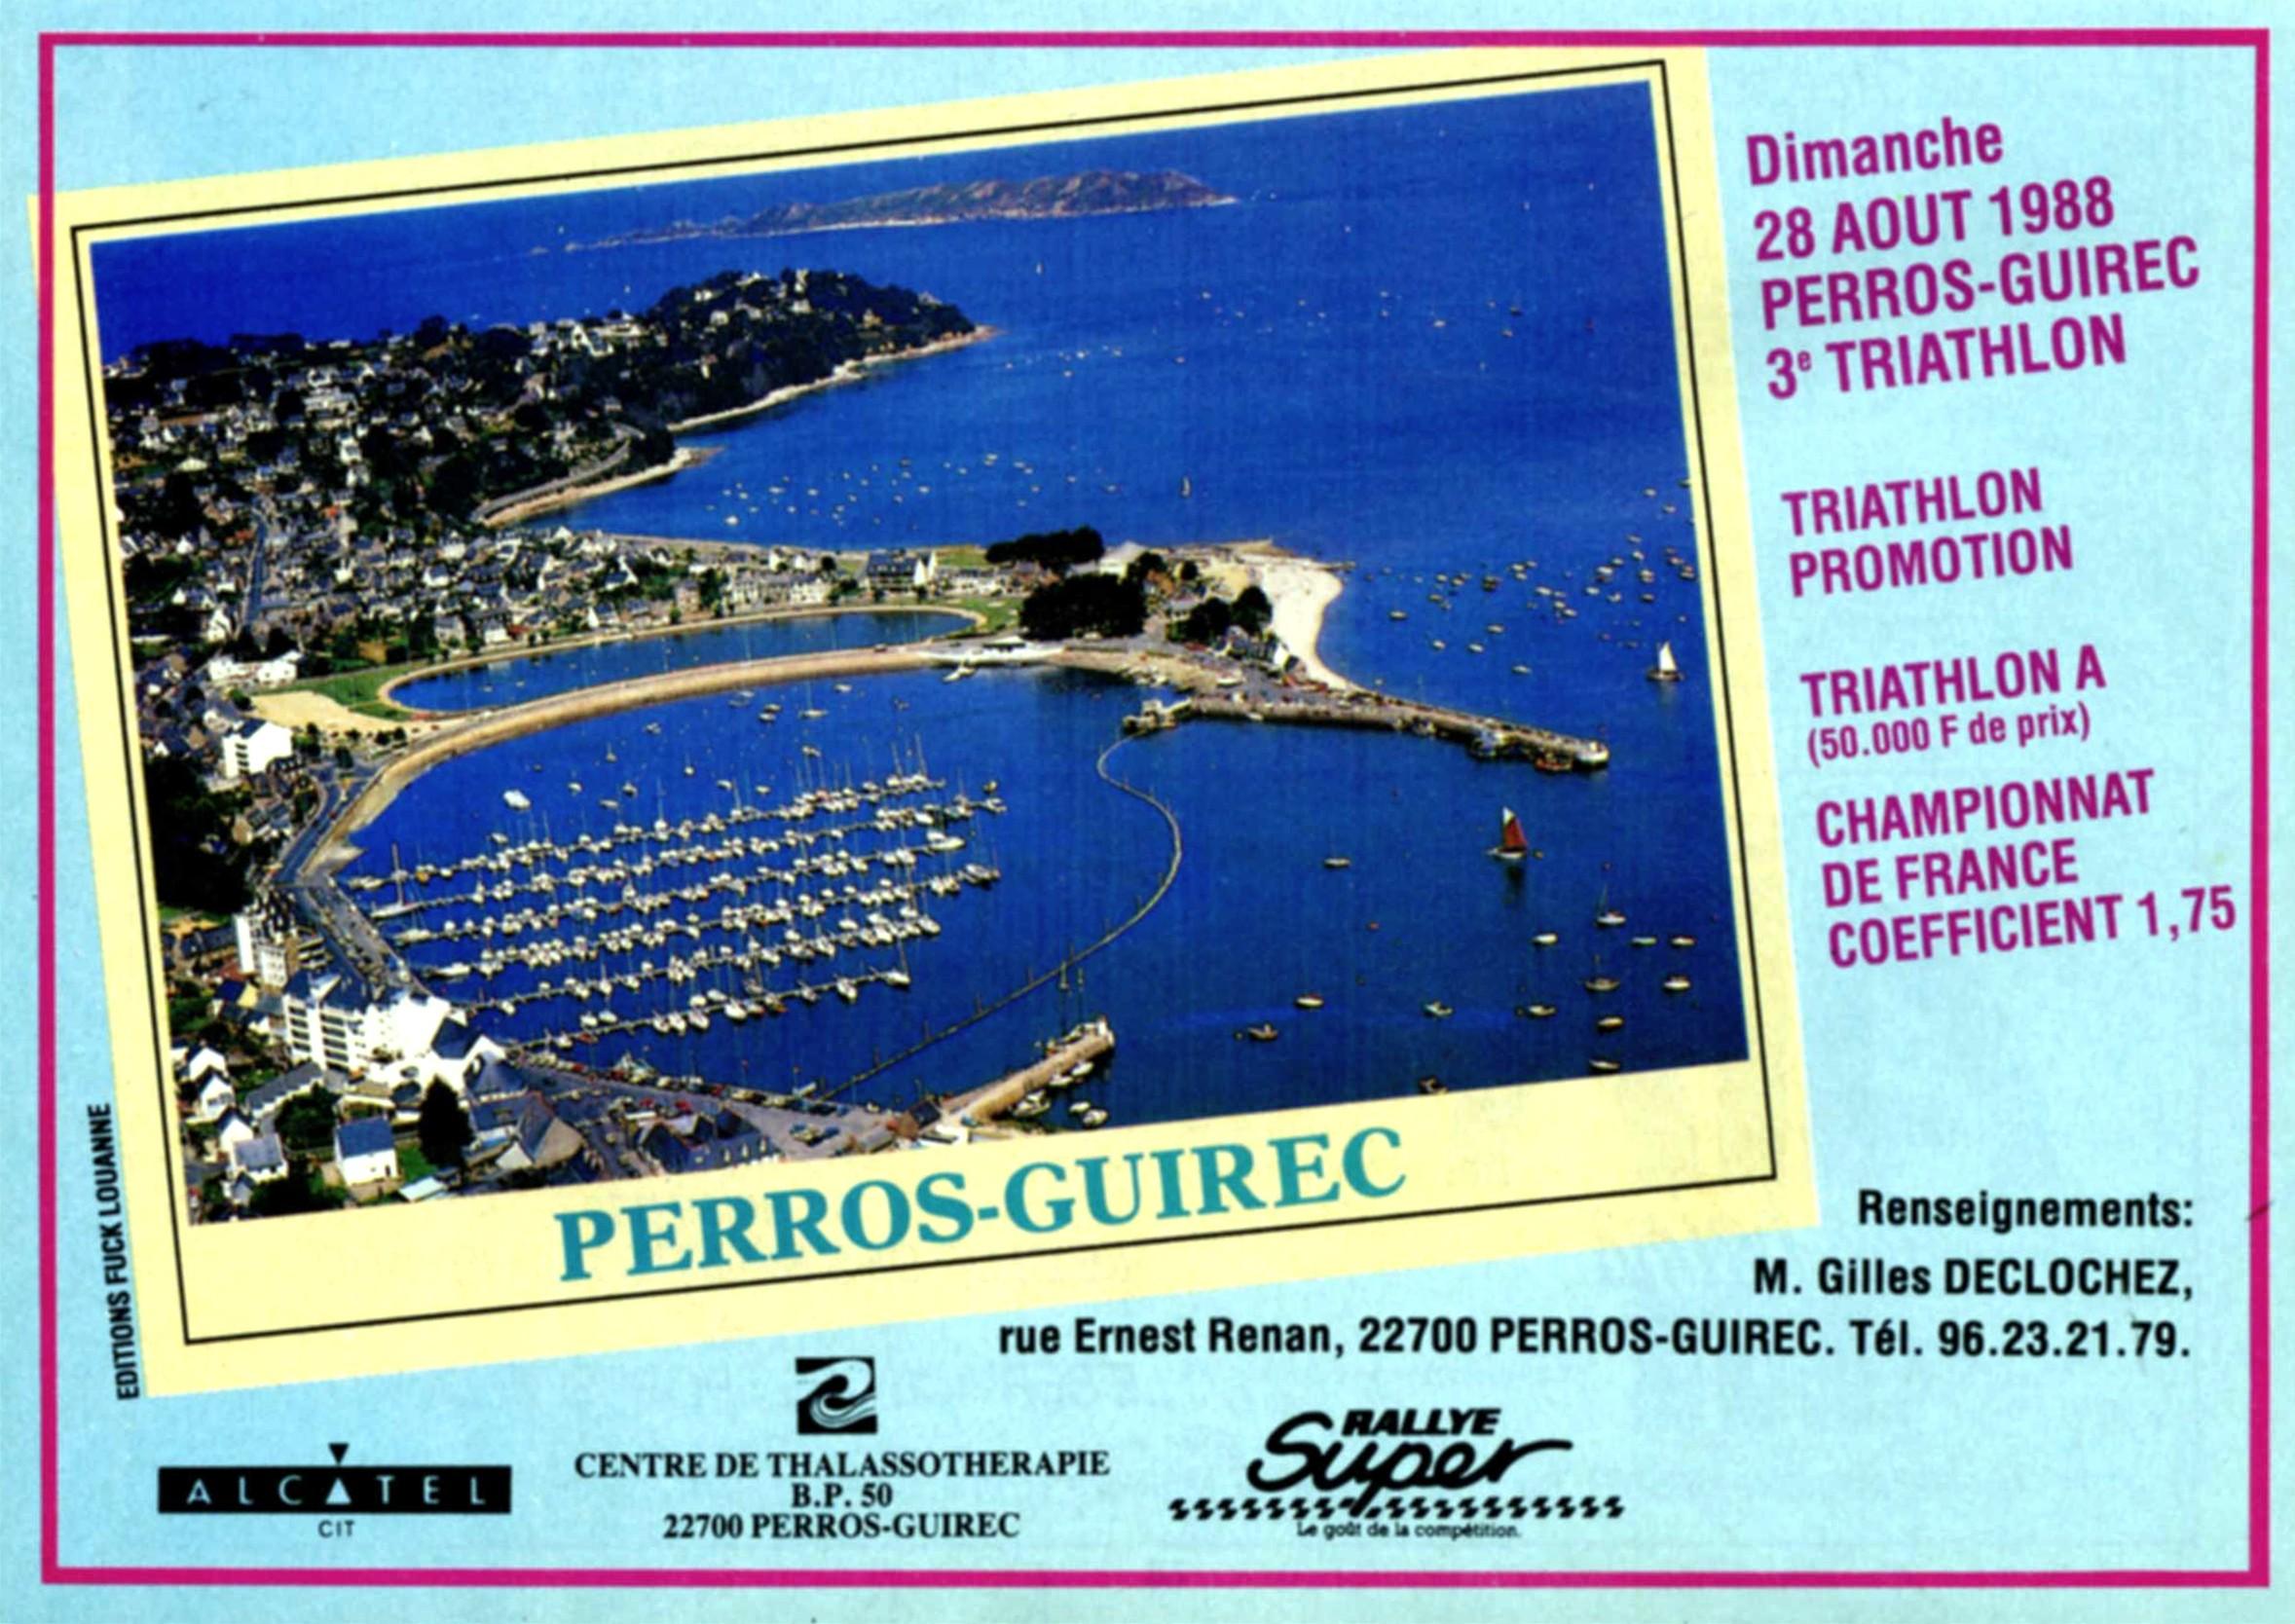 img971_perros-guirec_28-08-1988